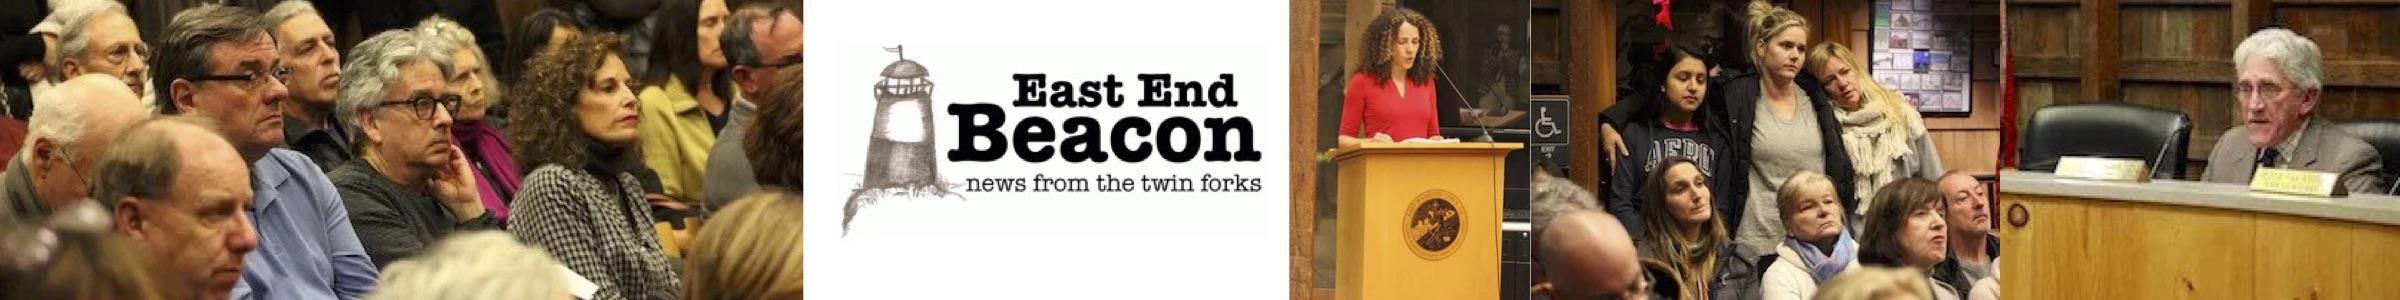 EAST END BEACON MASTHEAD 2.17.2017 copy.jpg